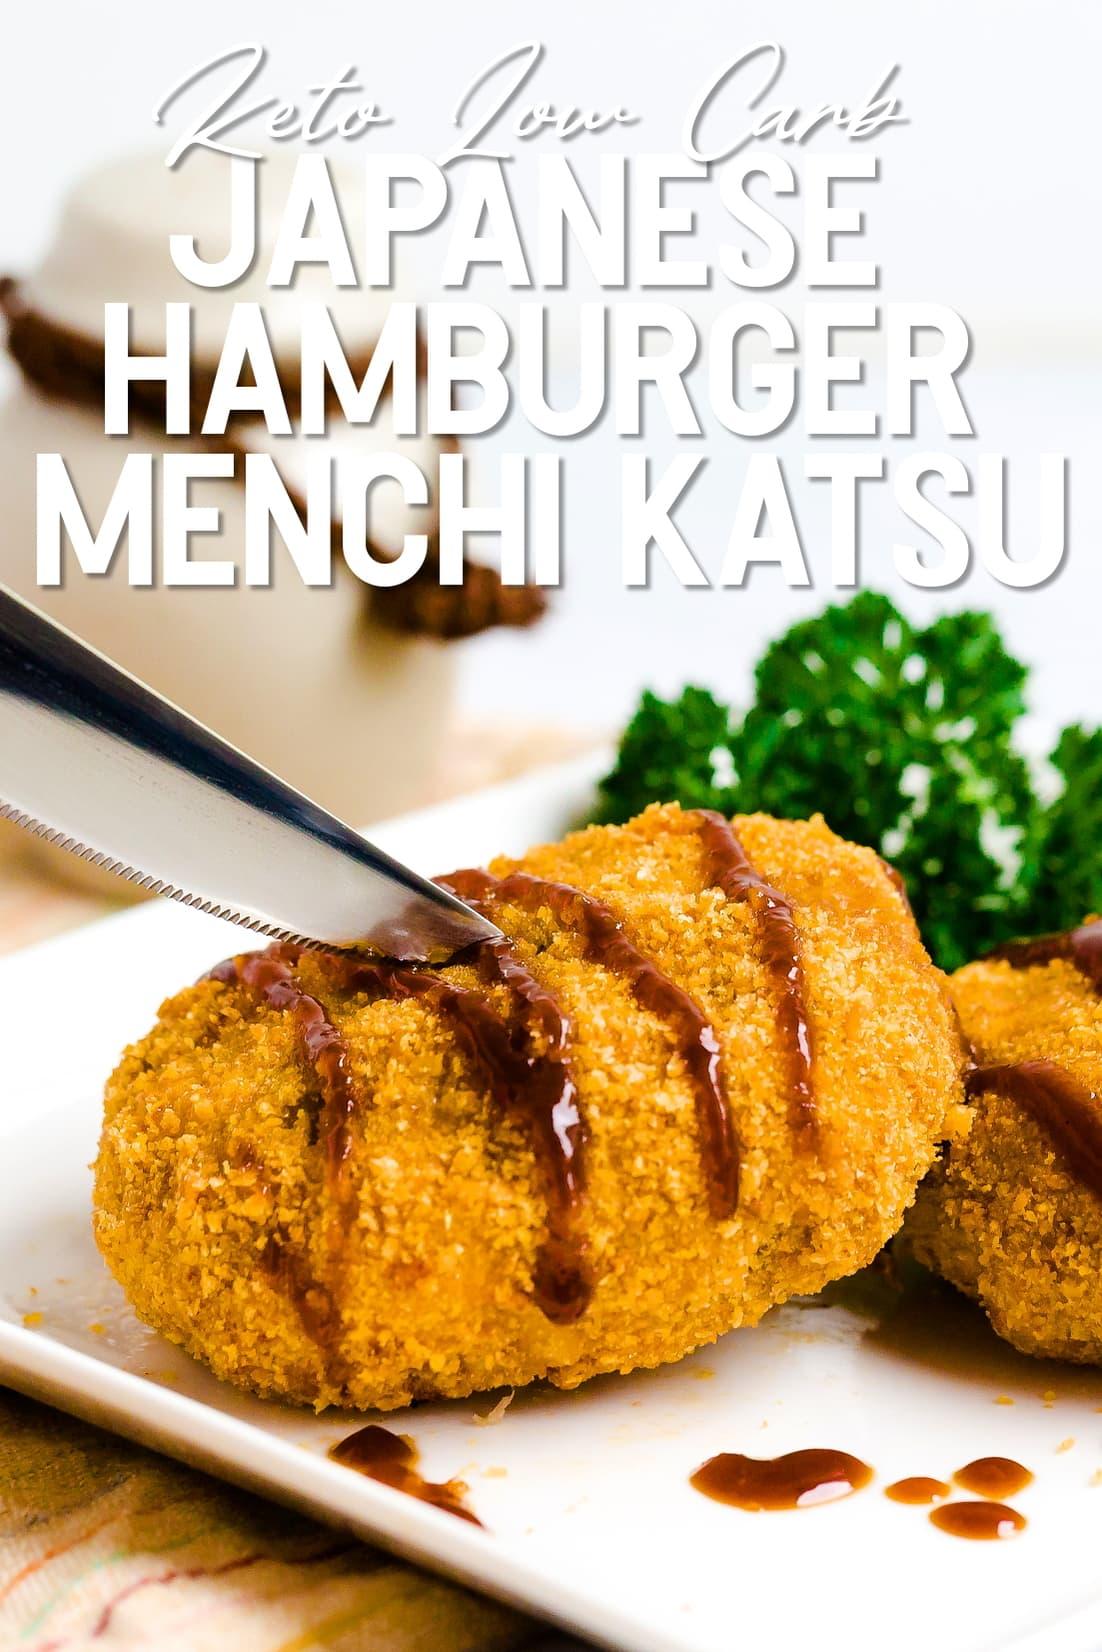 Keto Japanese Hamburger Cutlet Menchi Katsu with tonkatsu sauce being cut